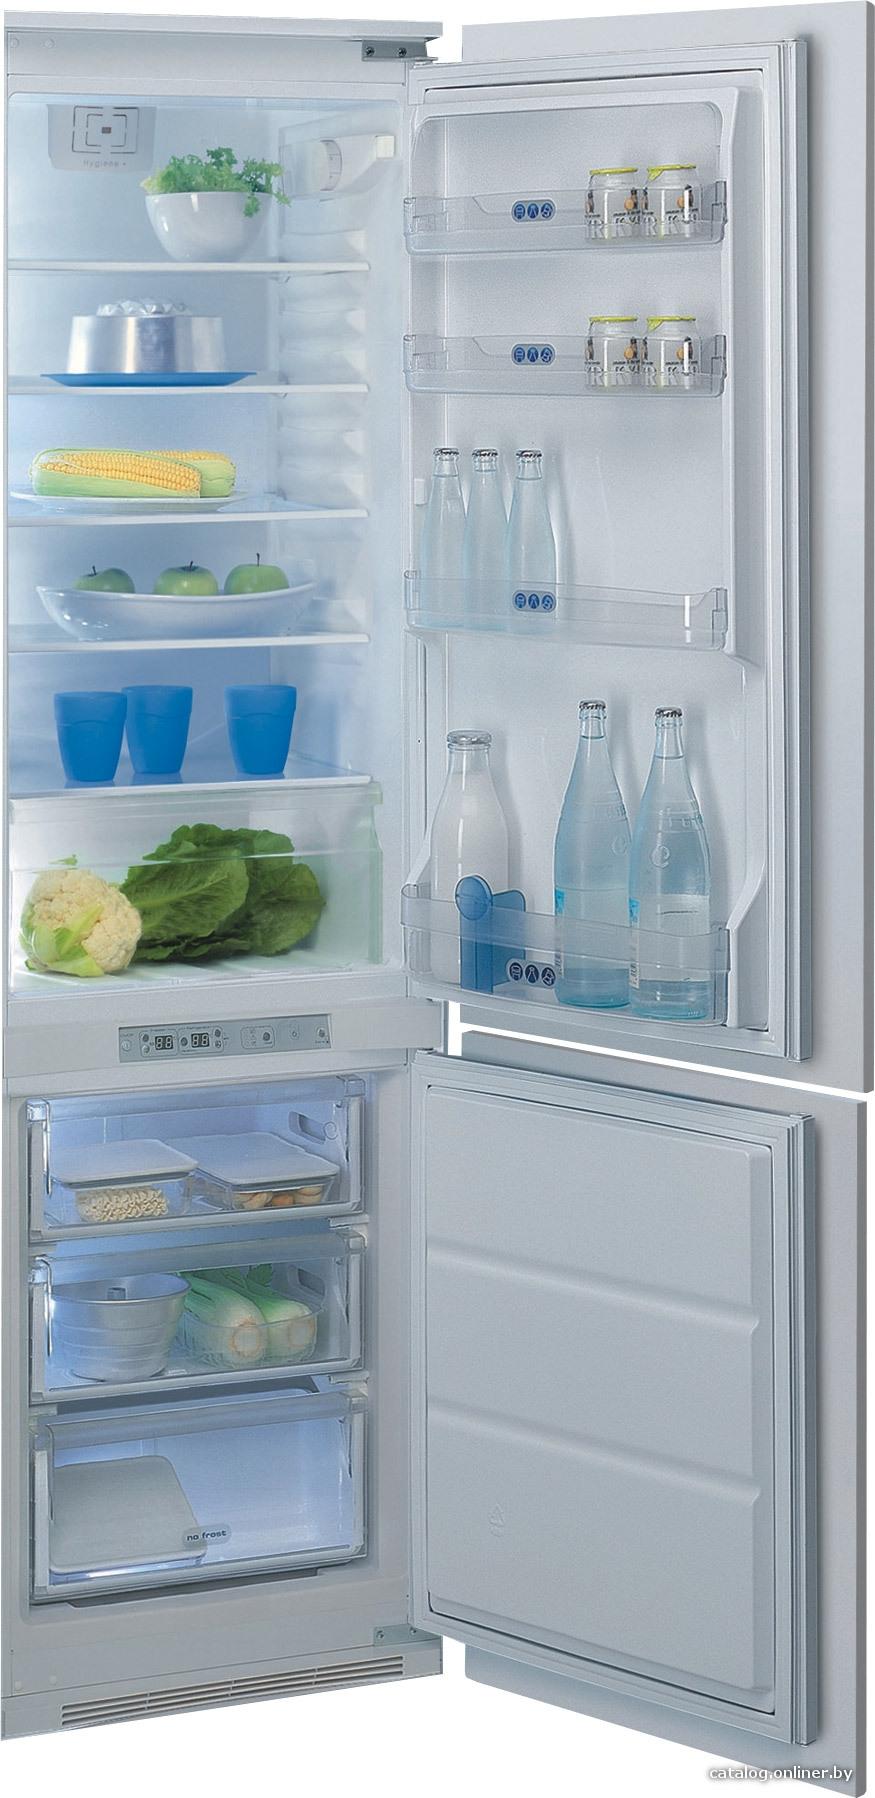 холодильник вирпул схема встраивания